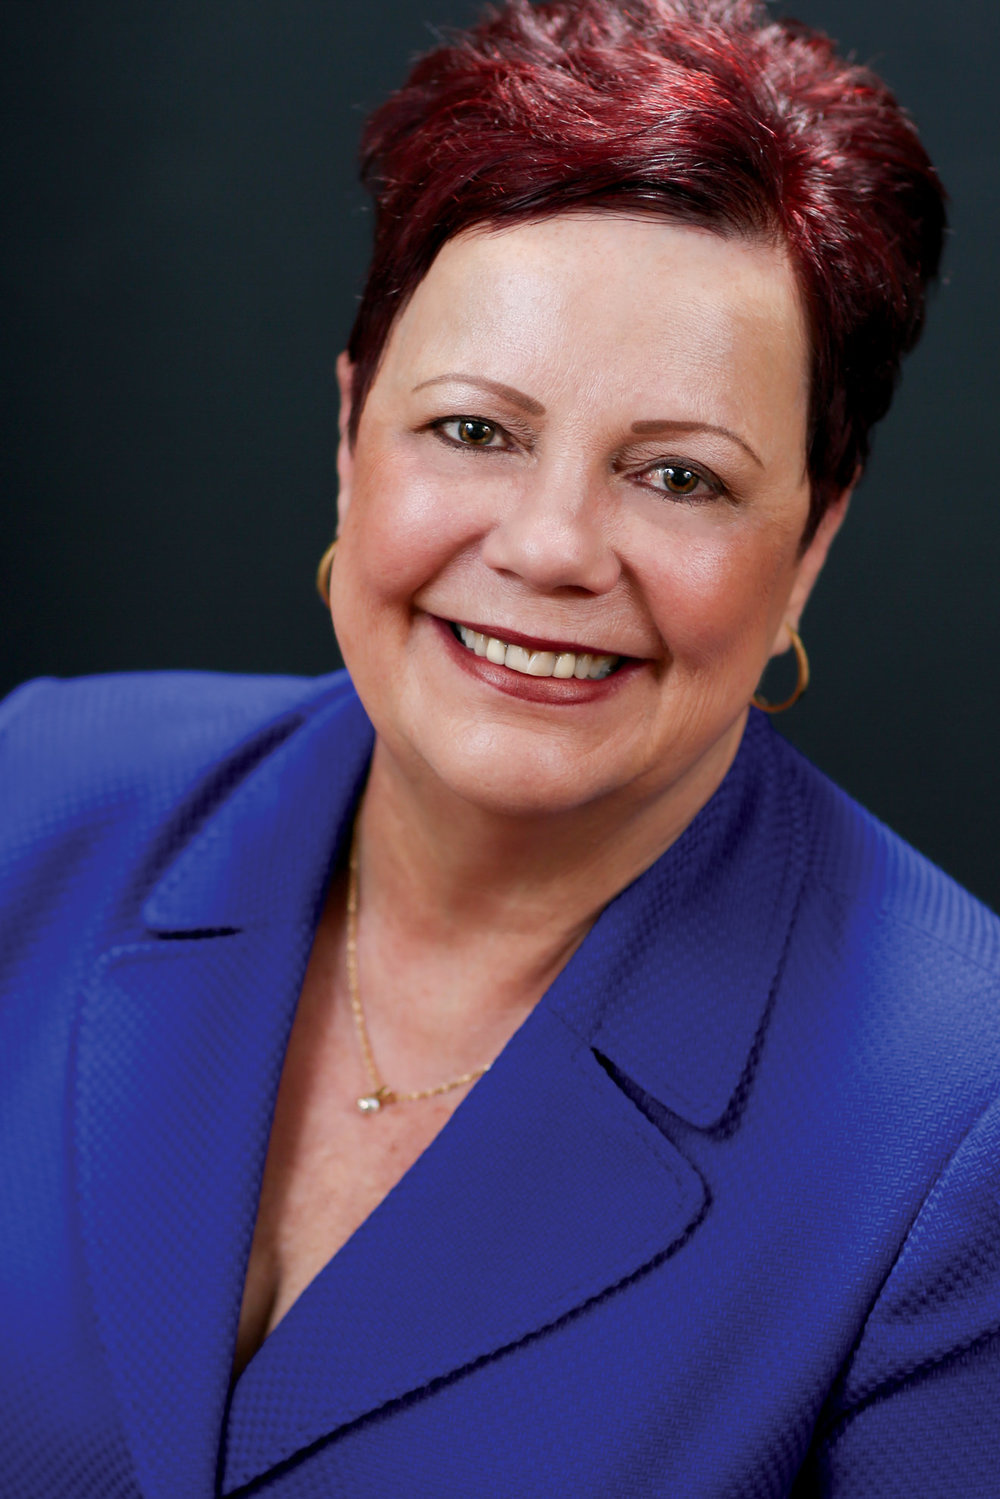 Pam Testroet - President